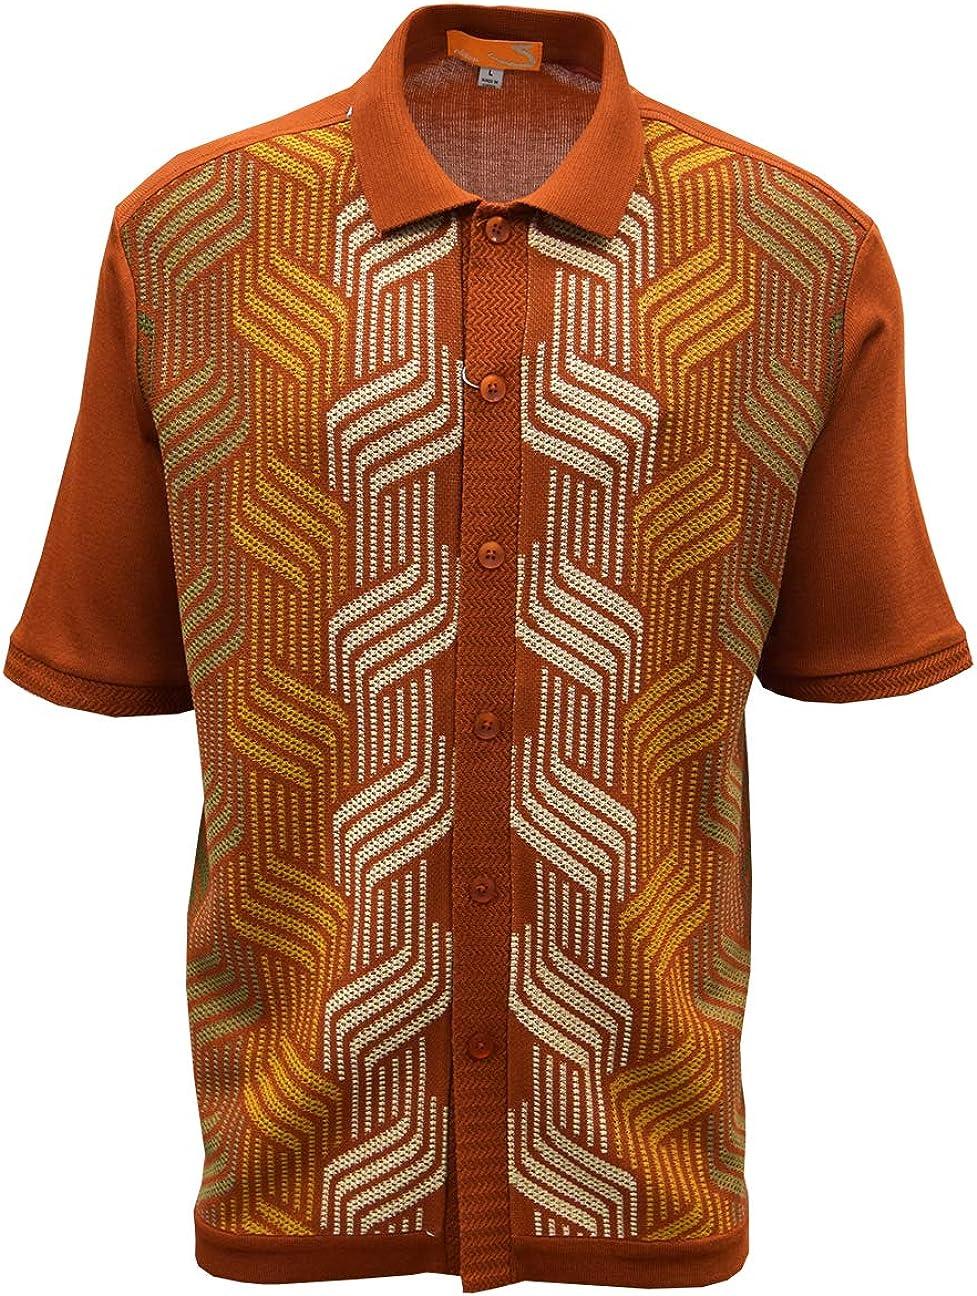 Mens Vintage Shirts – Casual, Dress, T-shirts, Polos Edition-S Men's Short Sleeve Knit Shirt- California Rockabilly Style: Mosaic Honeycomb Jacquard $49.00 AT vintagedancer.com